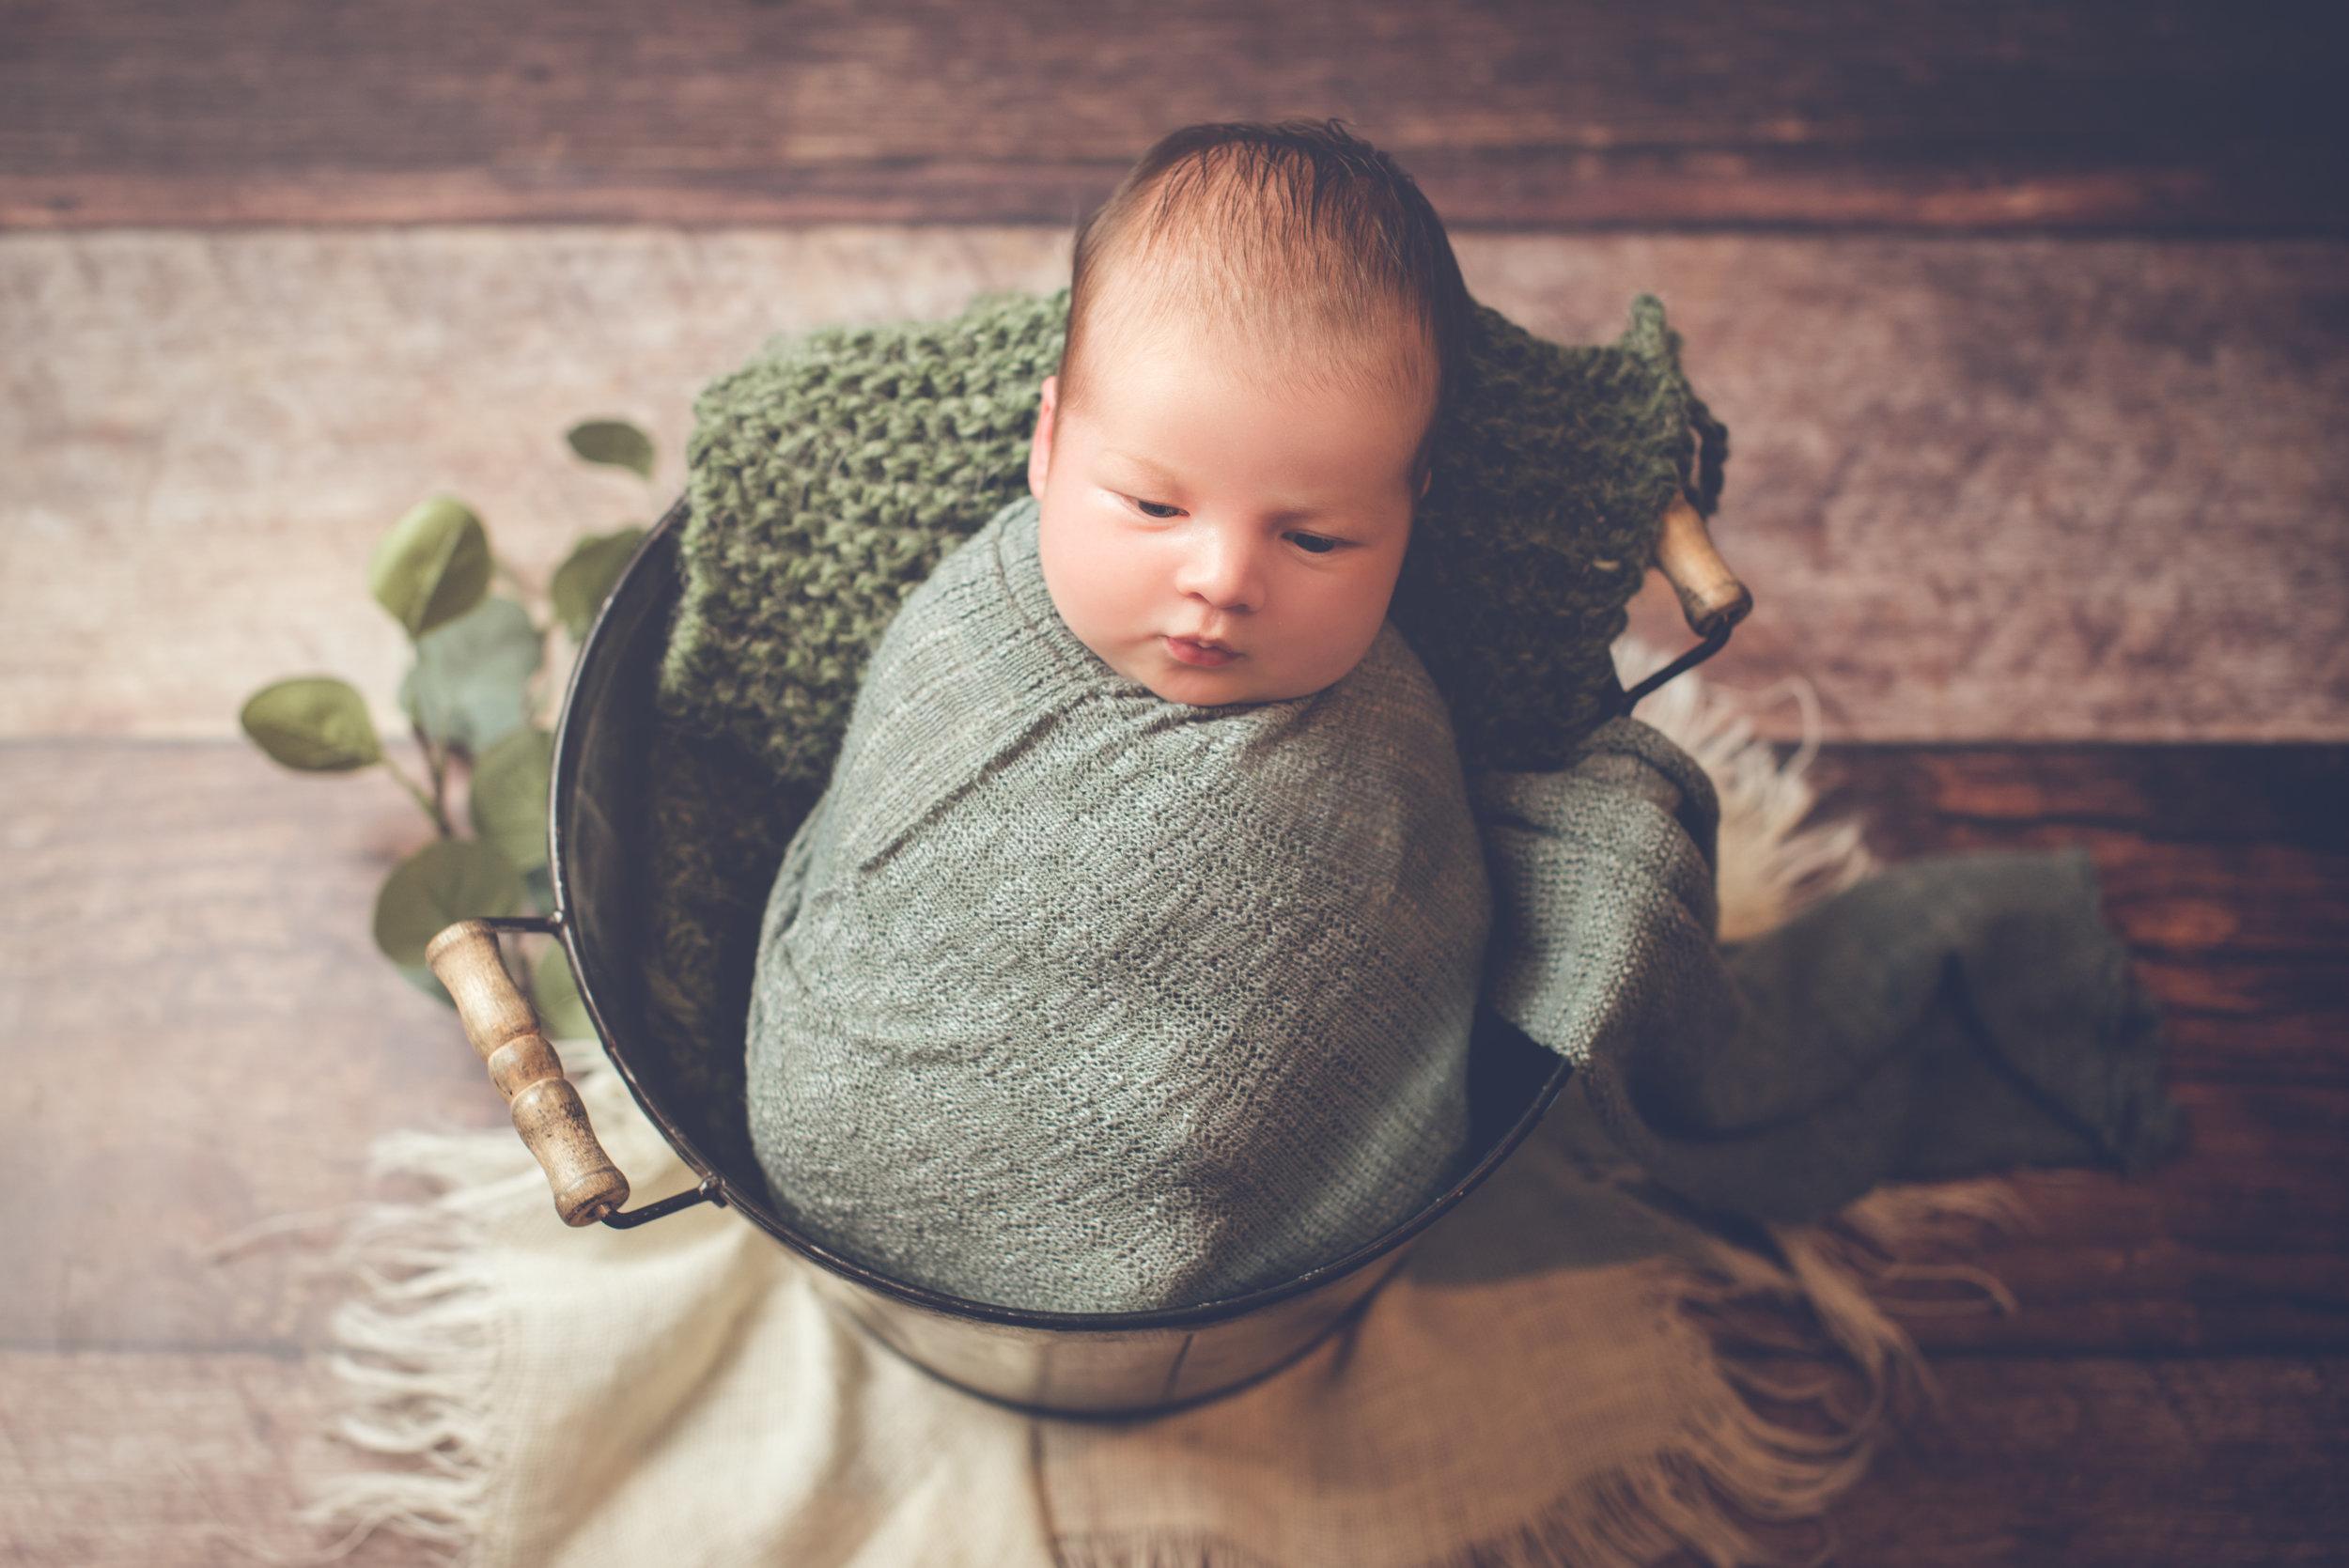 Newborn_Asher_24Days-5.jpg